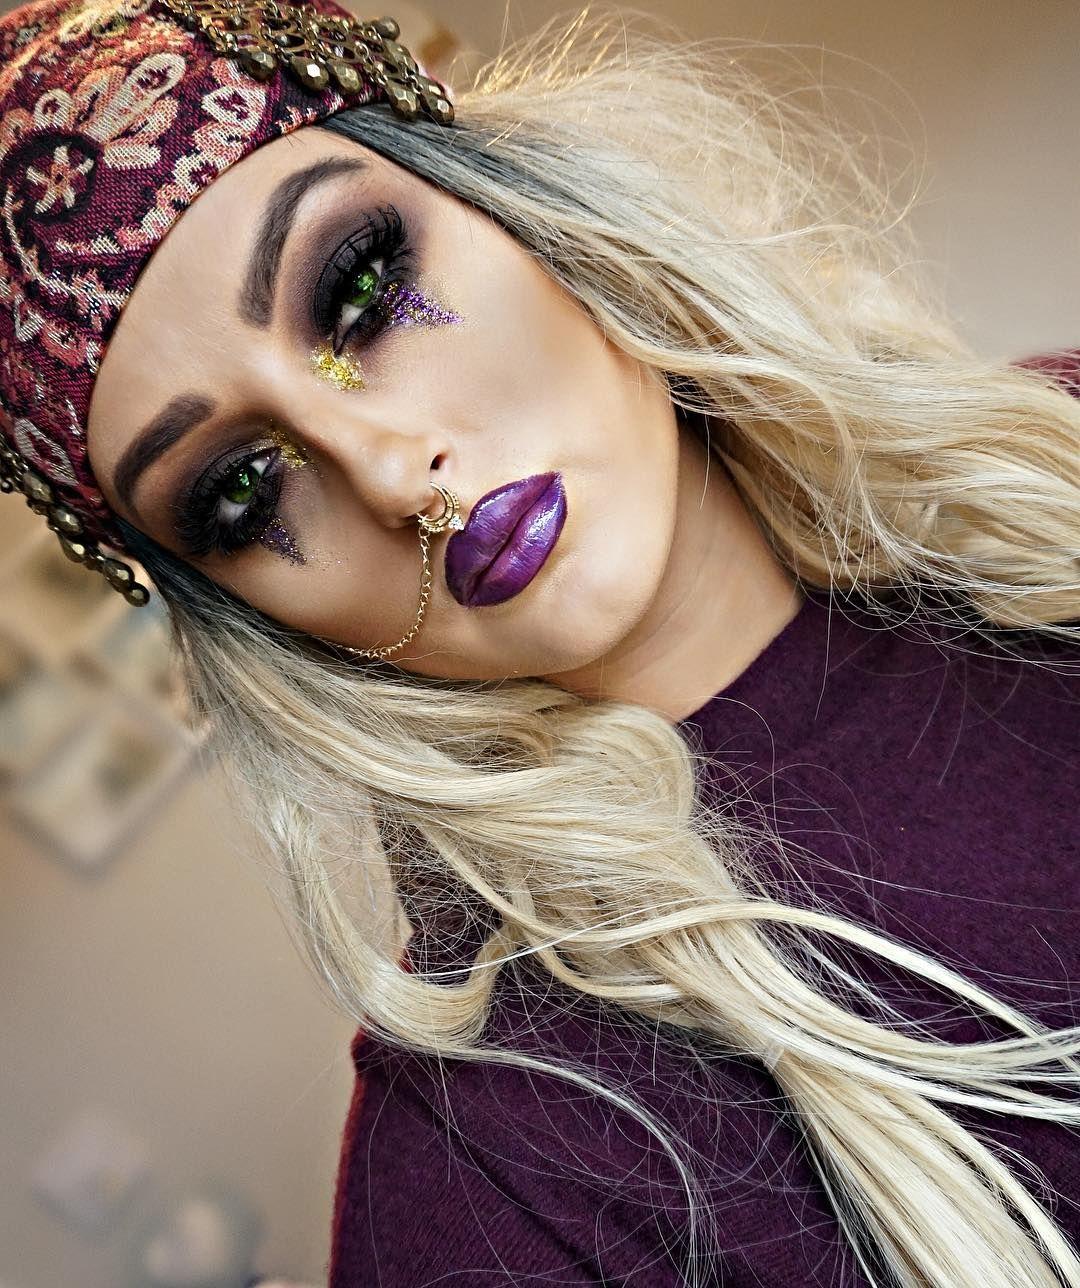 "Photo of Jessica Wyatt MUA på Instagram: ""Gypsy Makeup for Halloween 🔮📿🎃 #makeup #fortuneteller #magic #ombre #gold #gypsy #makeup #makeupartist #artist #mua # ilovemaciggirls …"""